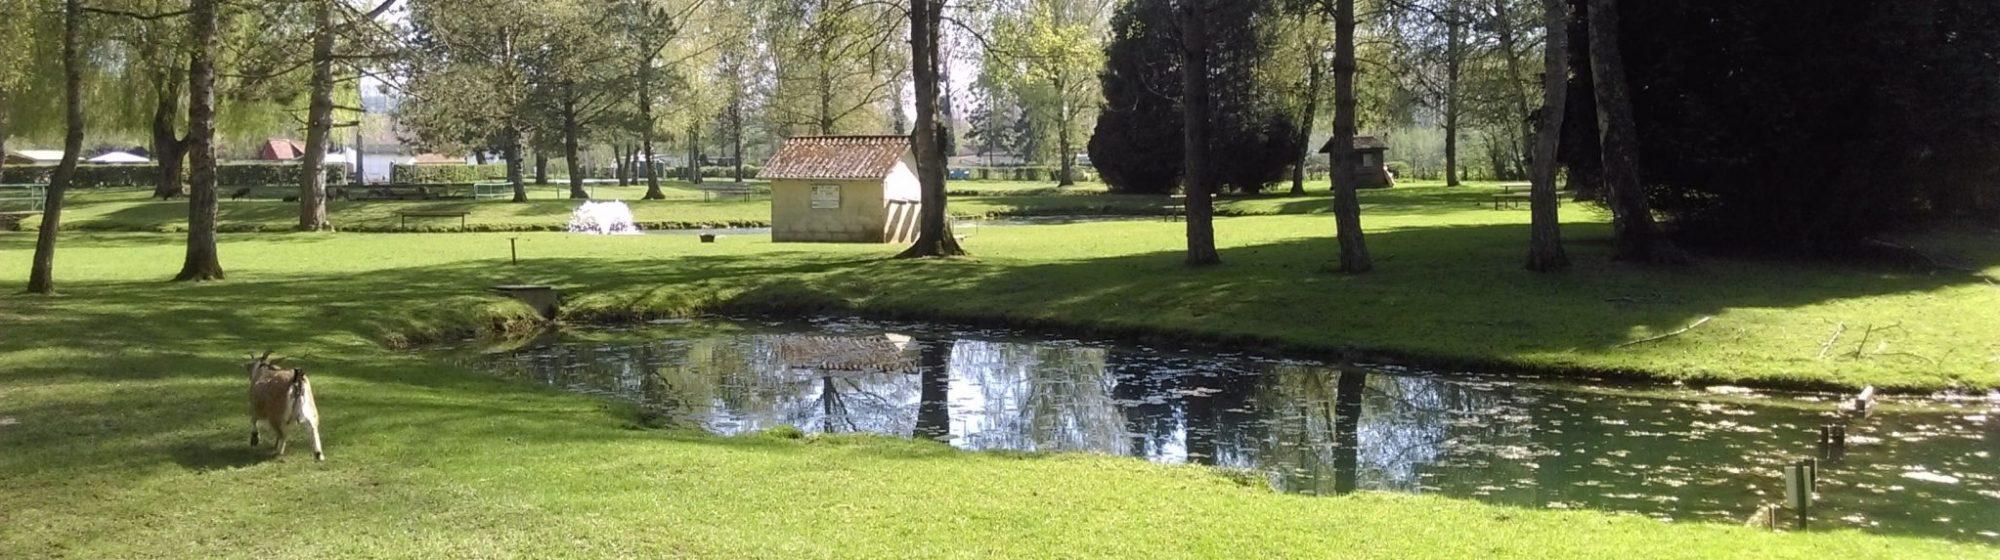 emplacement camping Pas de Calais